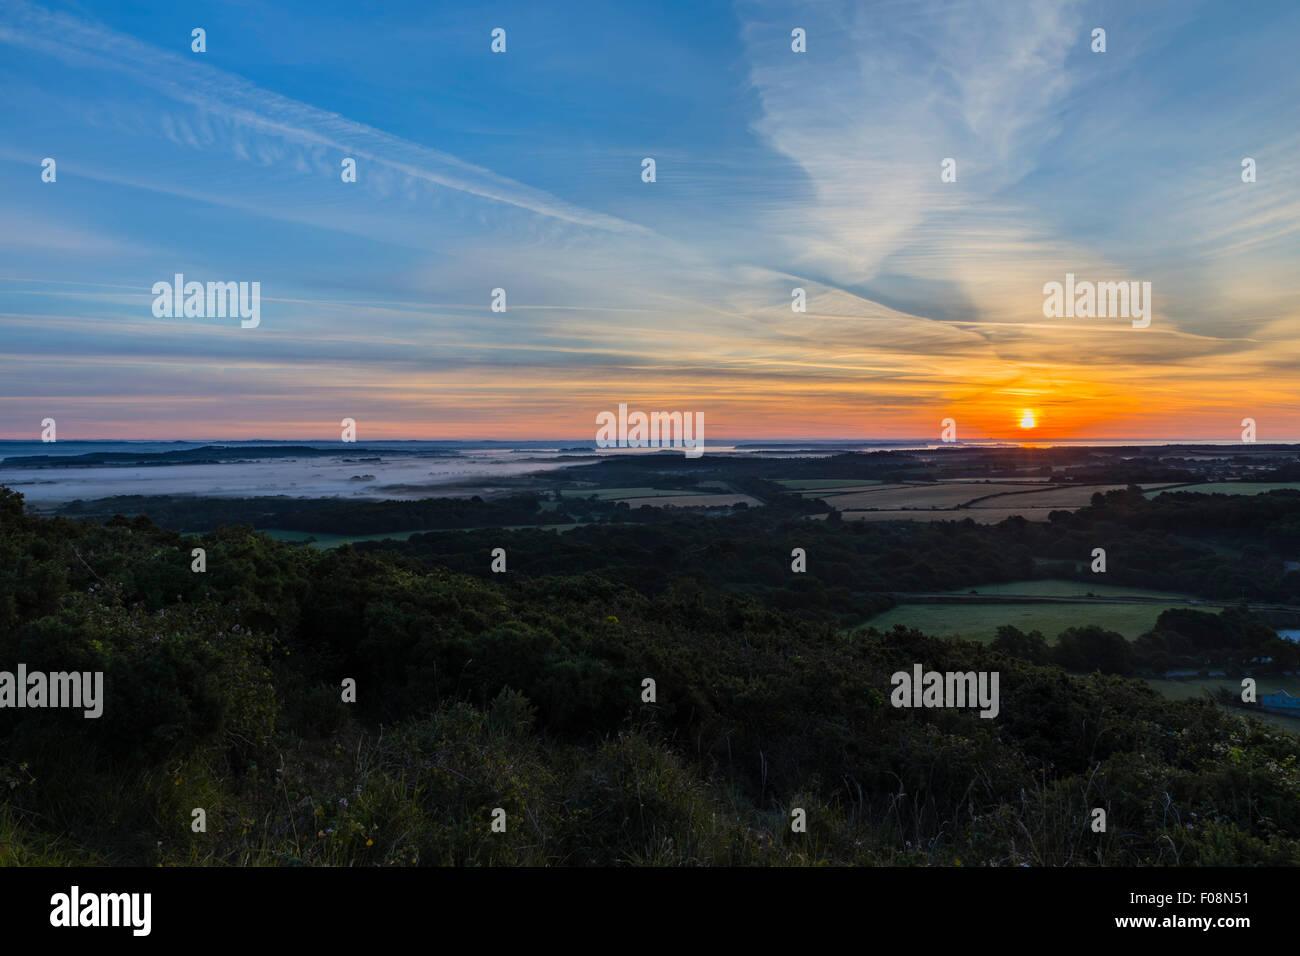 Sunrise over the Dorset countryside from near Corfe Castle, Isle of Purbeck, Dorset, England, United KingdomStock Photo